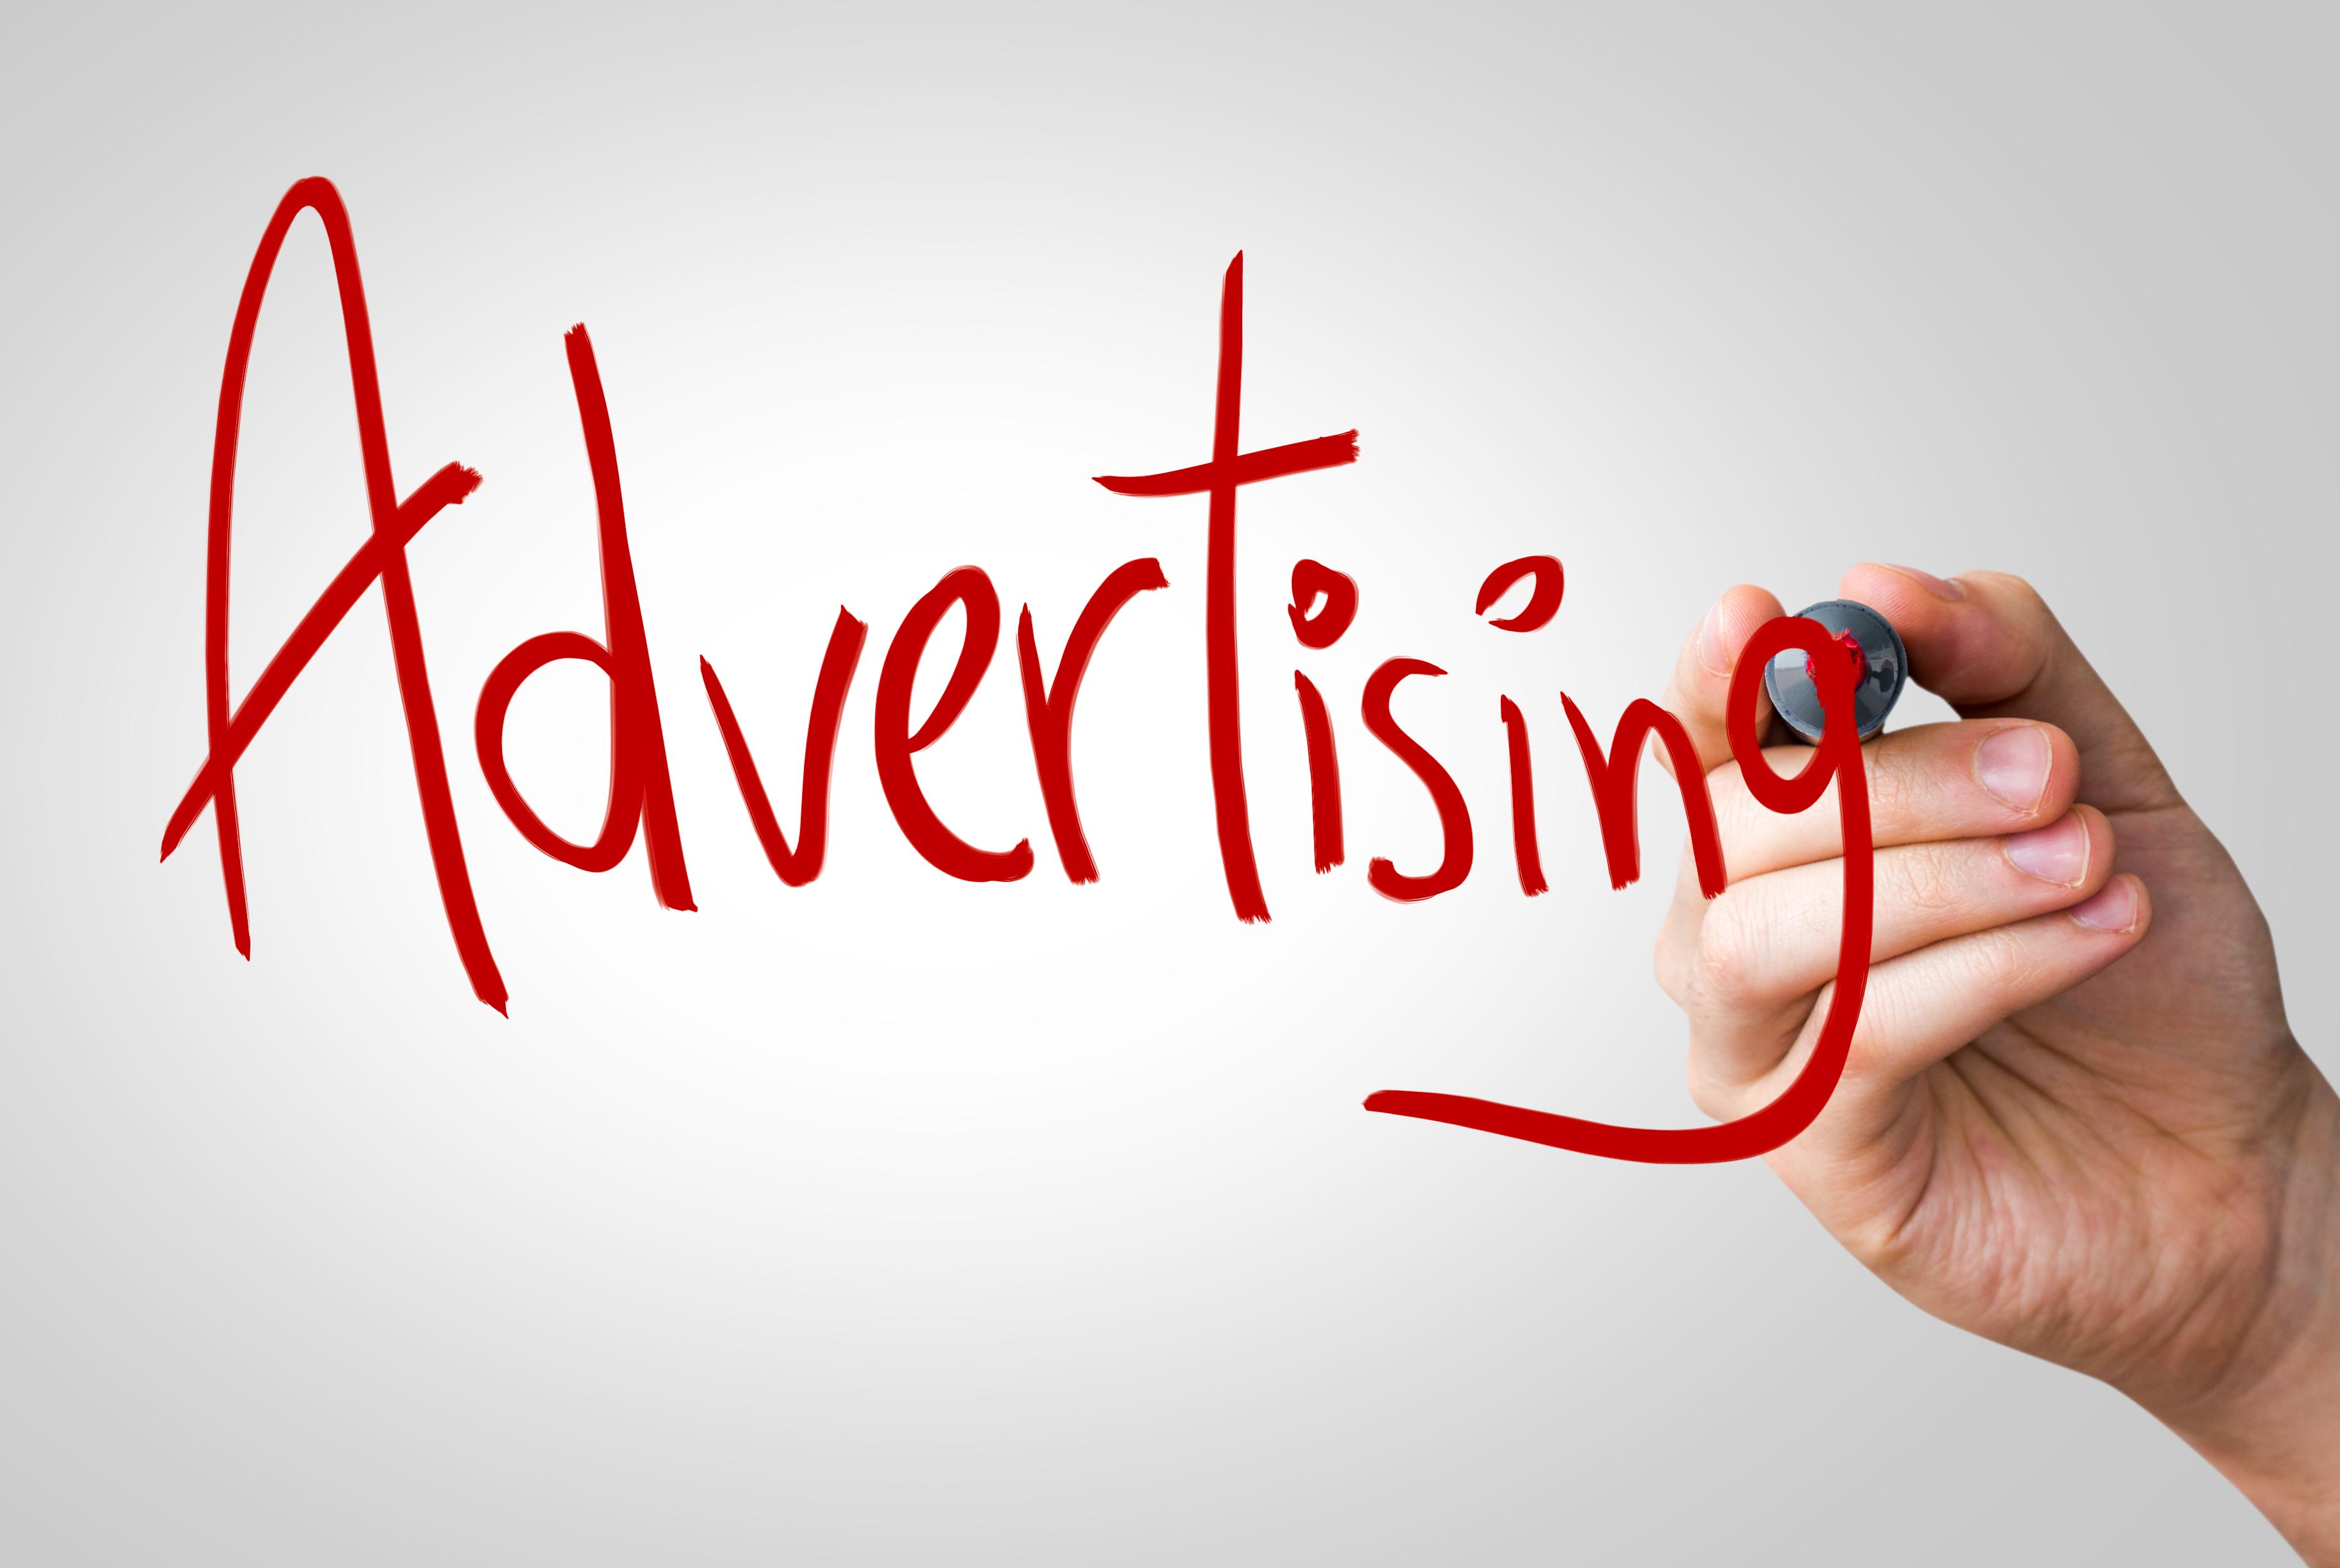 Advertising-shahbod noori